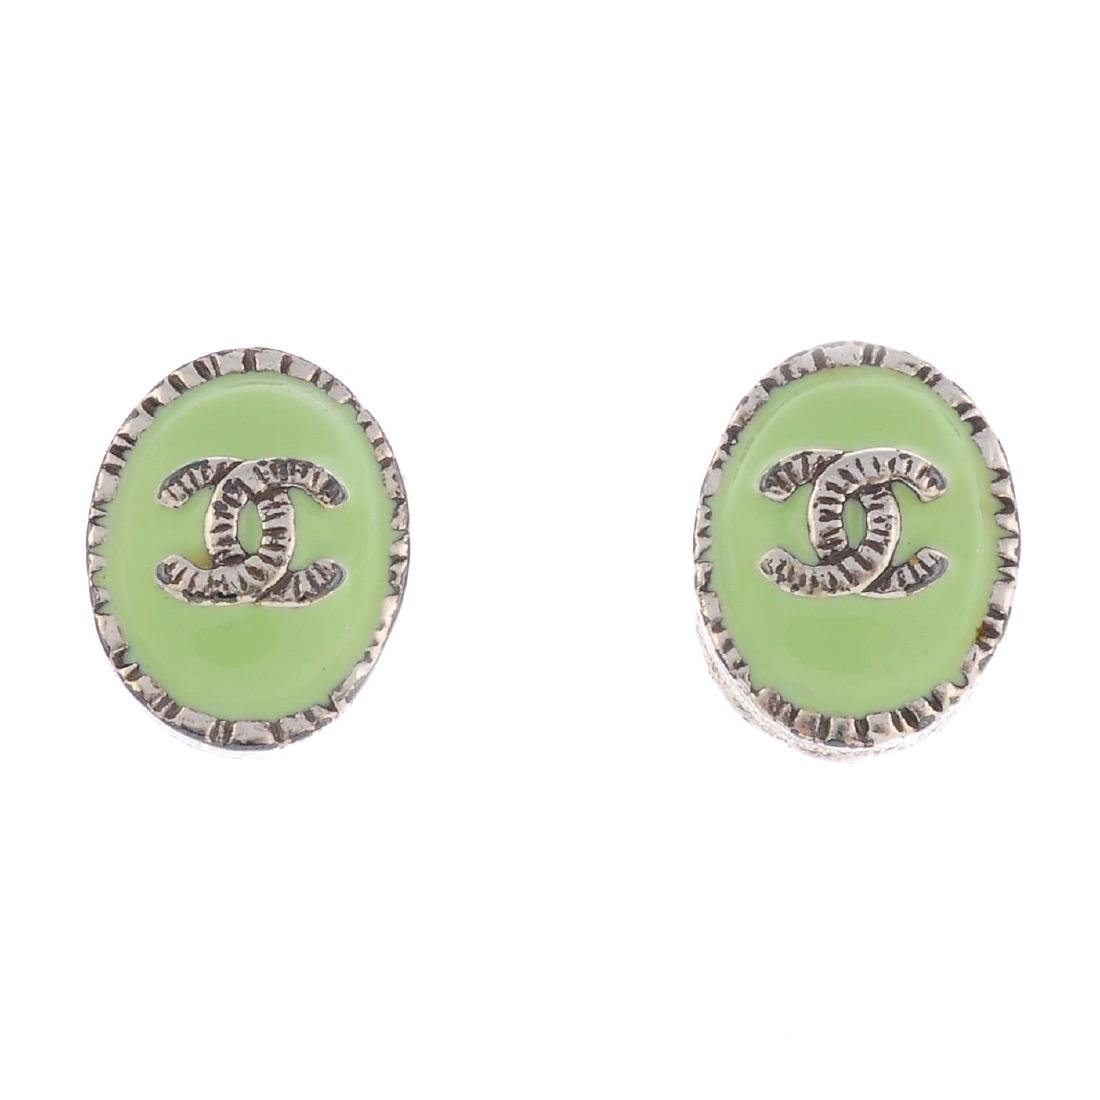 CHANEL - a pair of enamel ear-studs. Designed as pastel